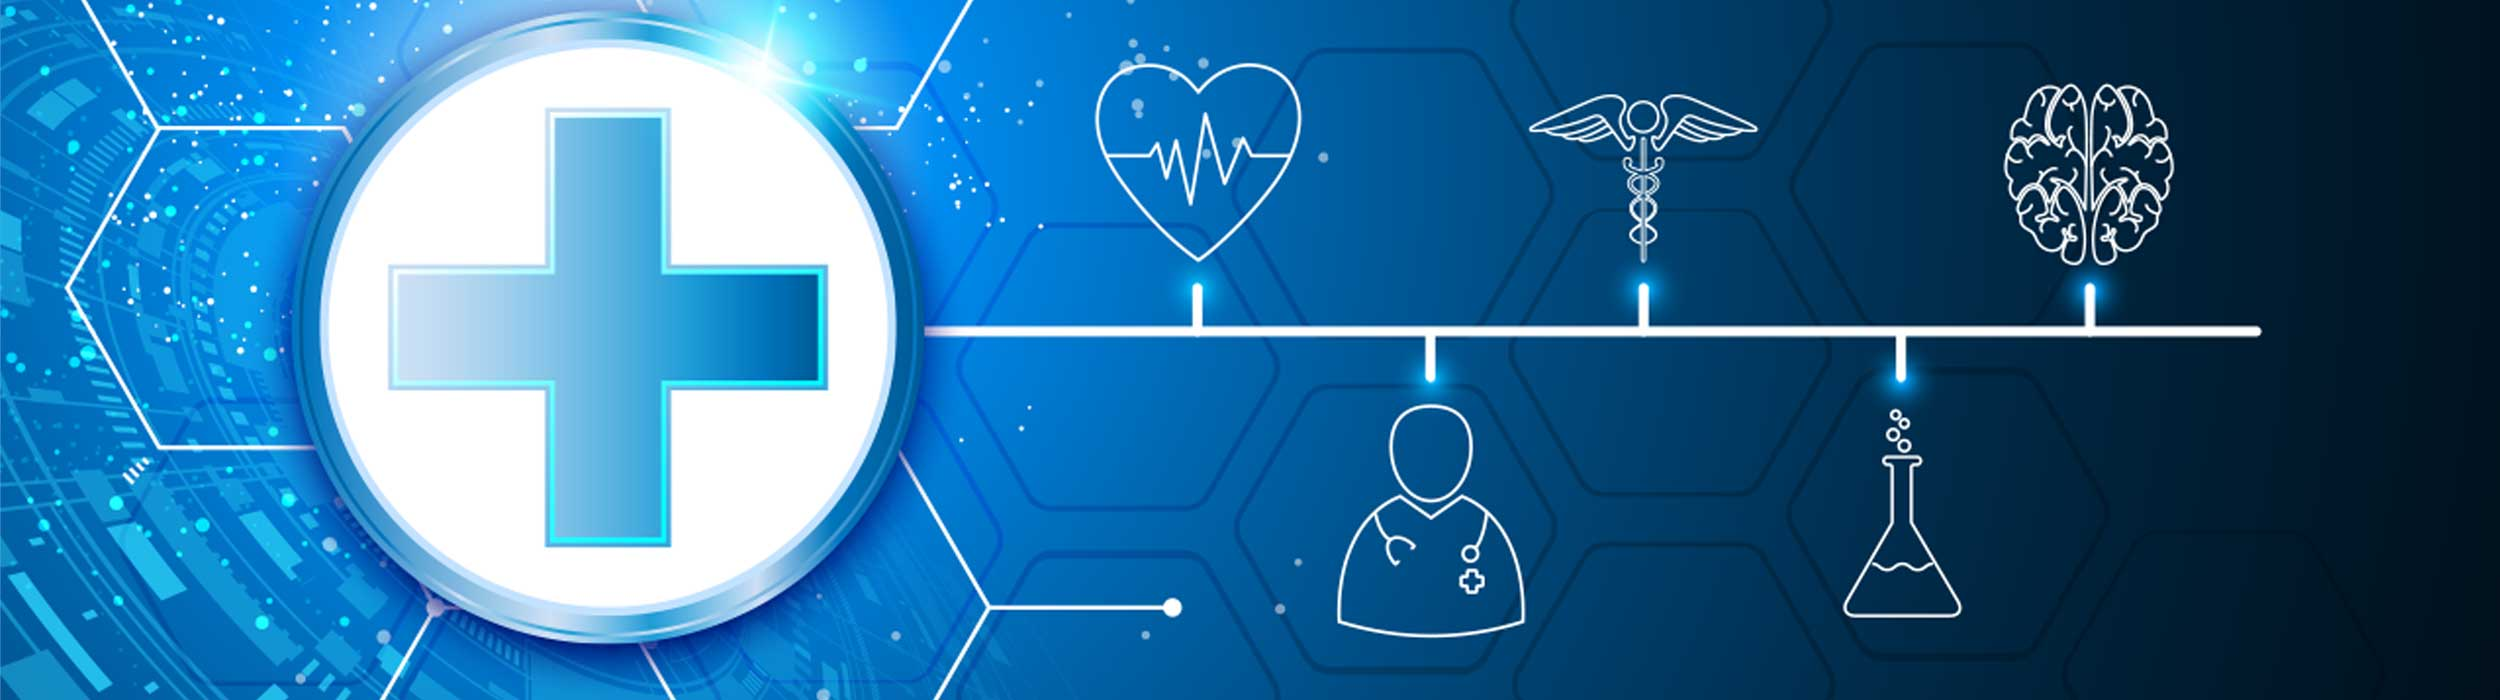 Progressive Medical, Inc  | Specialty Medical Products